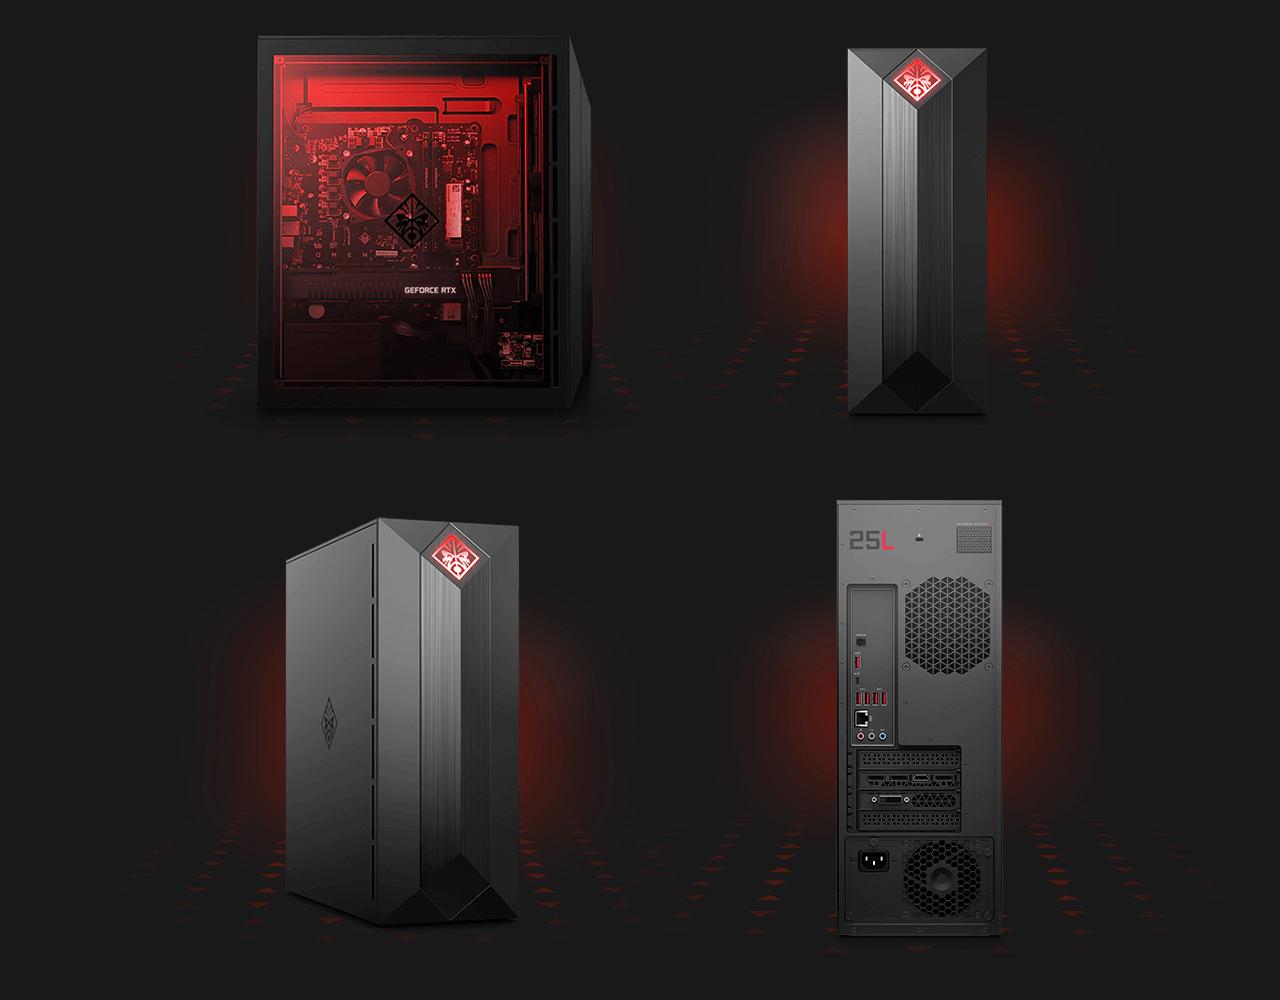 HP OMEN Obelisk 875-0069 Gaming Desktop Computer - Intel Core i3-8100 (3 60  GHz), NVIDIA GeForce GTX 1050 Ti 4 GB, 8 GB DDR4 Memory, 1 TB HDD, Windows